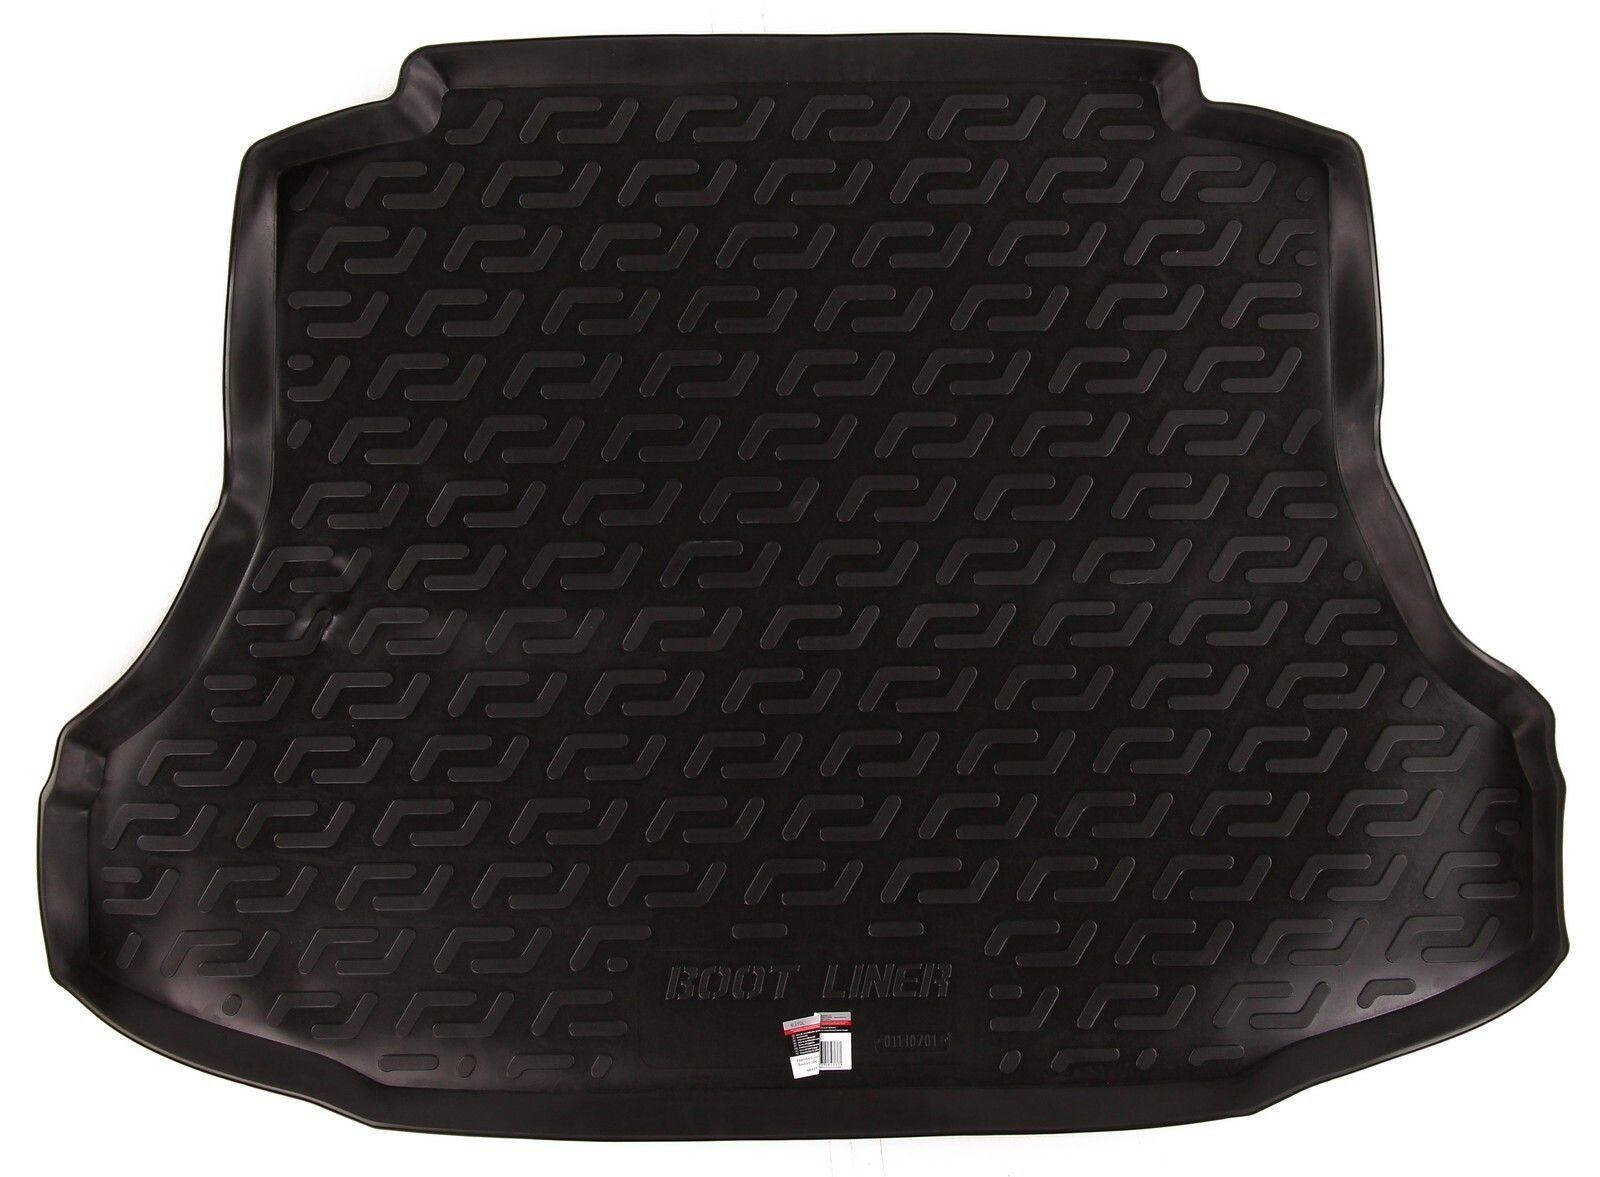 Vana do kufru gumová Honda Civic VIII Sedan (FD1/2/7 FA1 FG1/2 FA5 FK FN) (06-11)